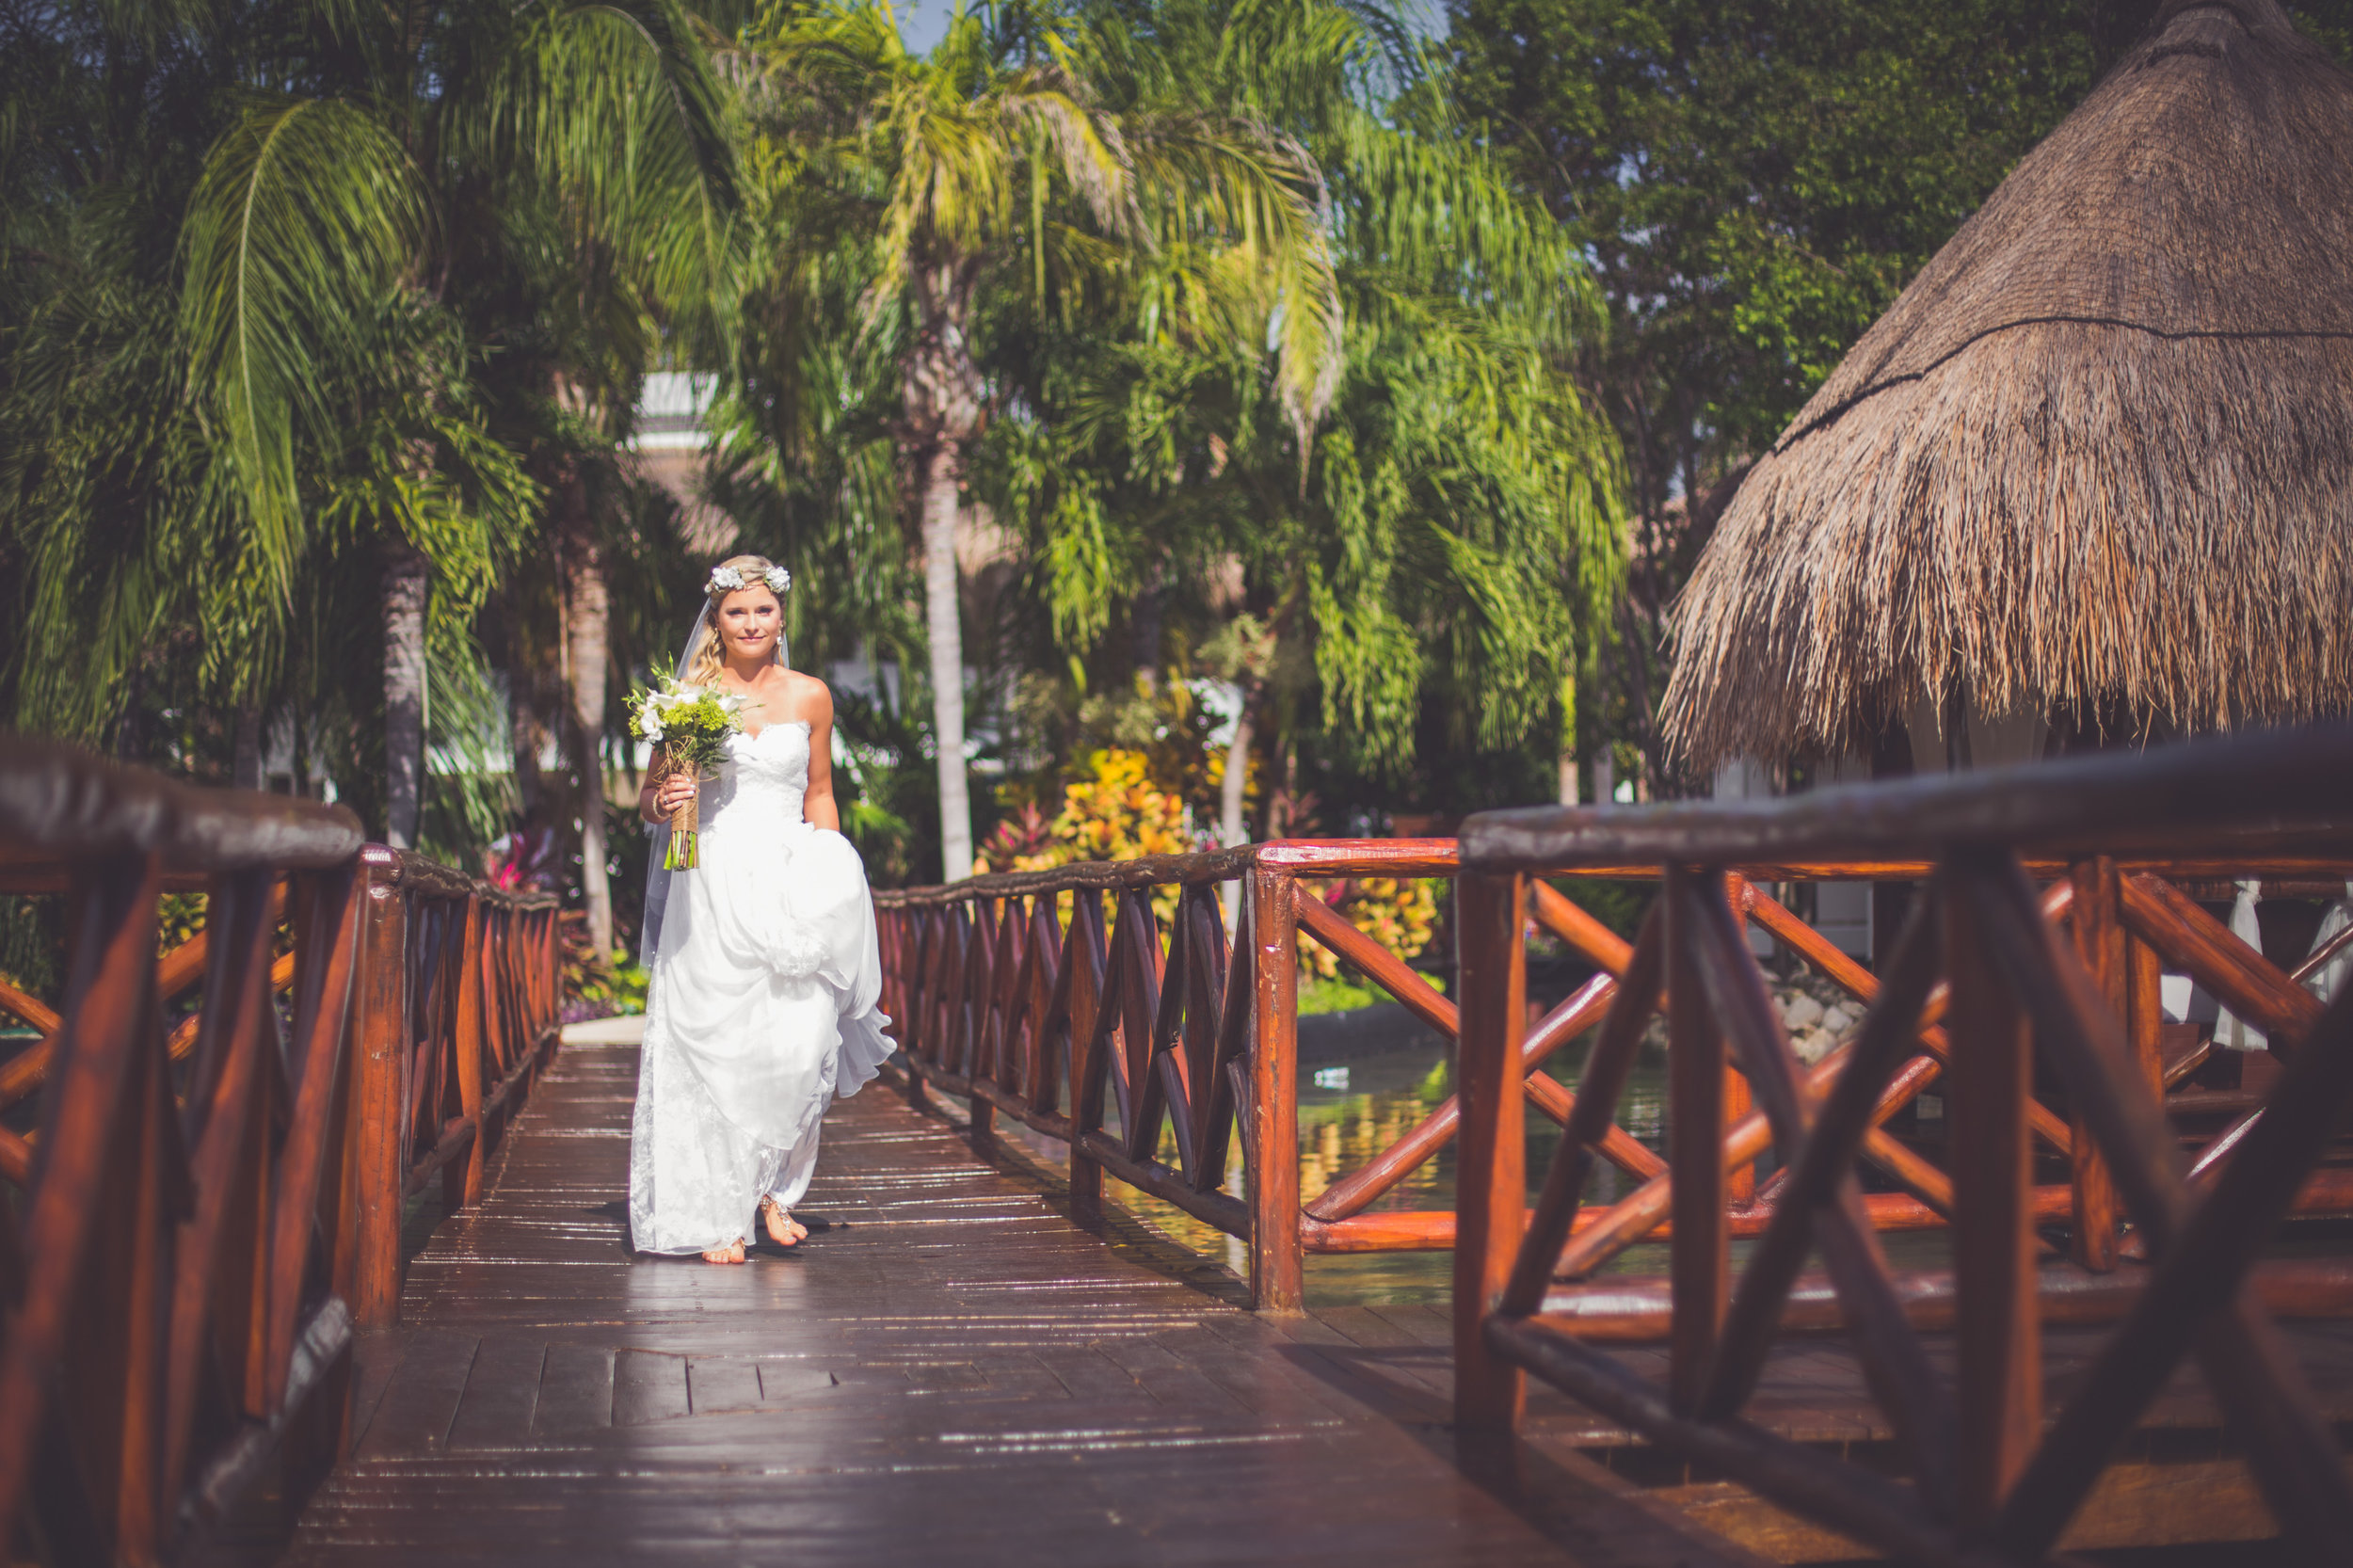 CARMEN-PETER-WEDDING-2016-42.jpg